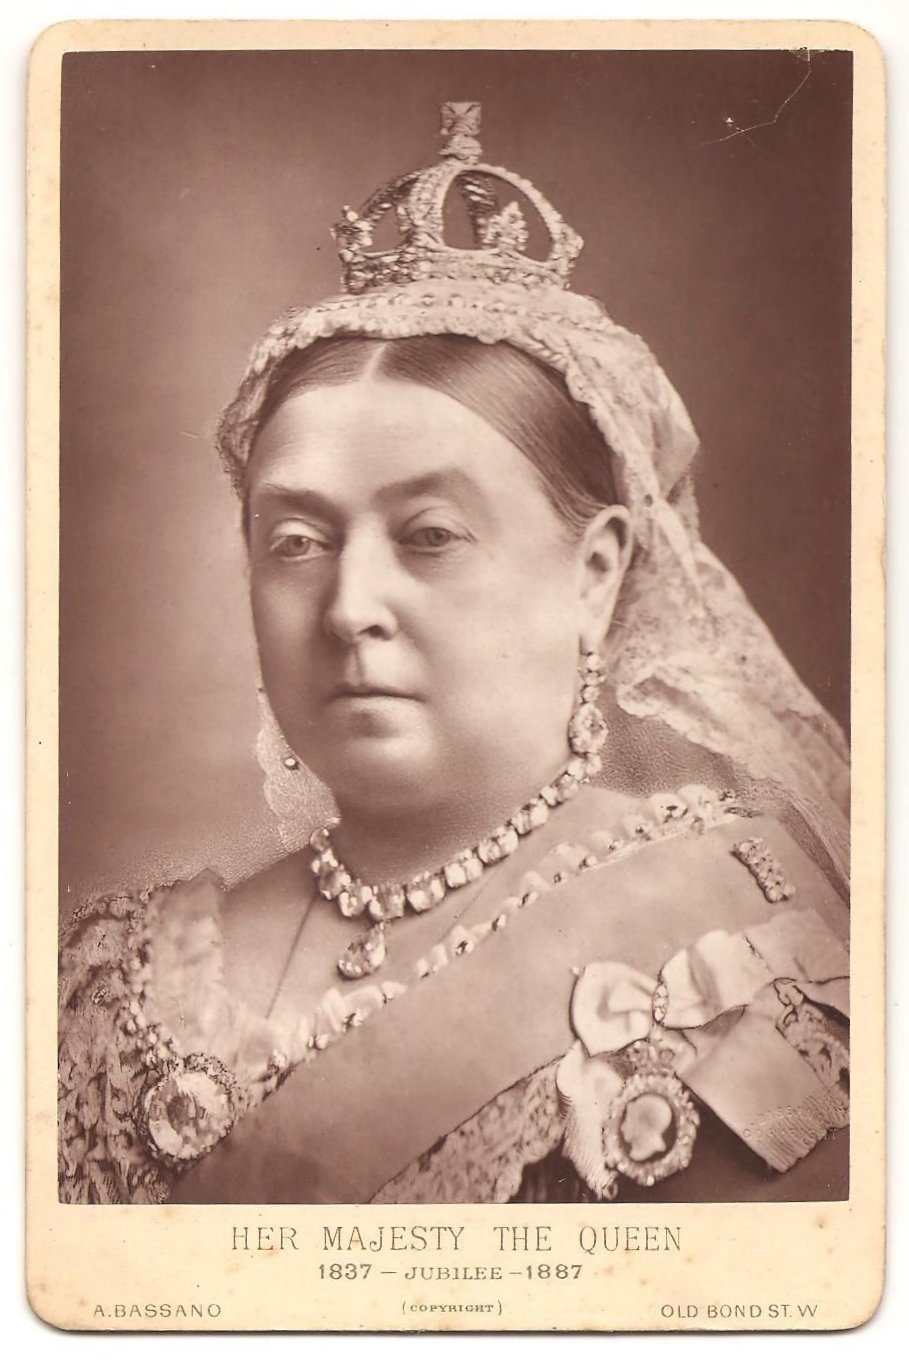 Queen Victoria by Bassano, 1887